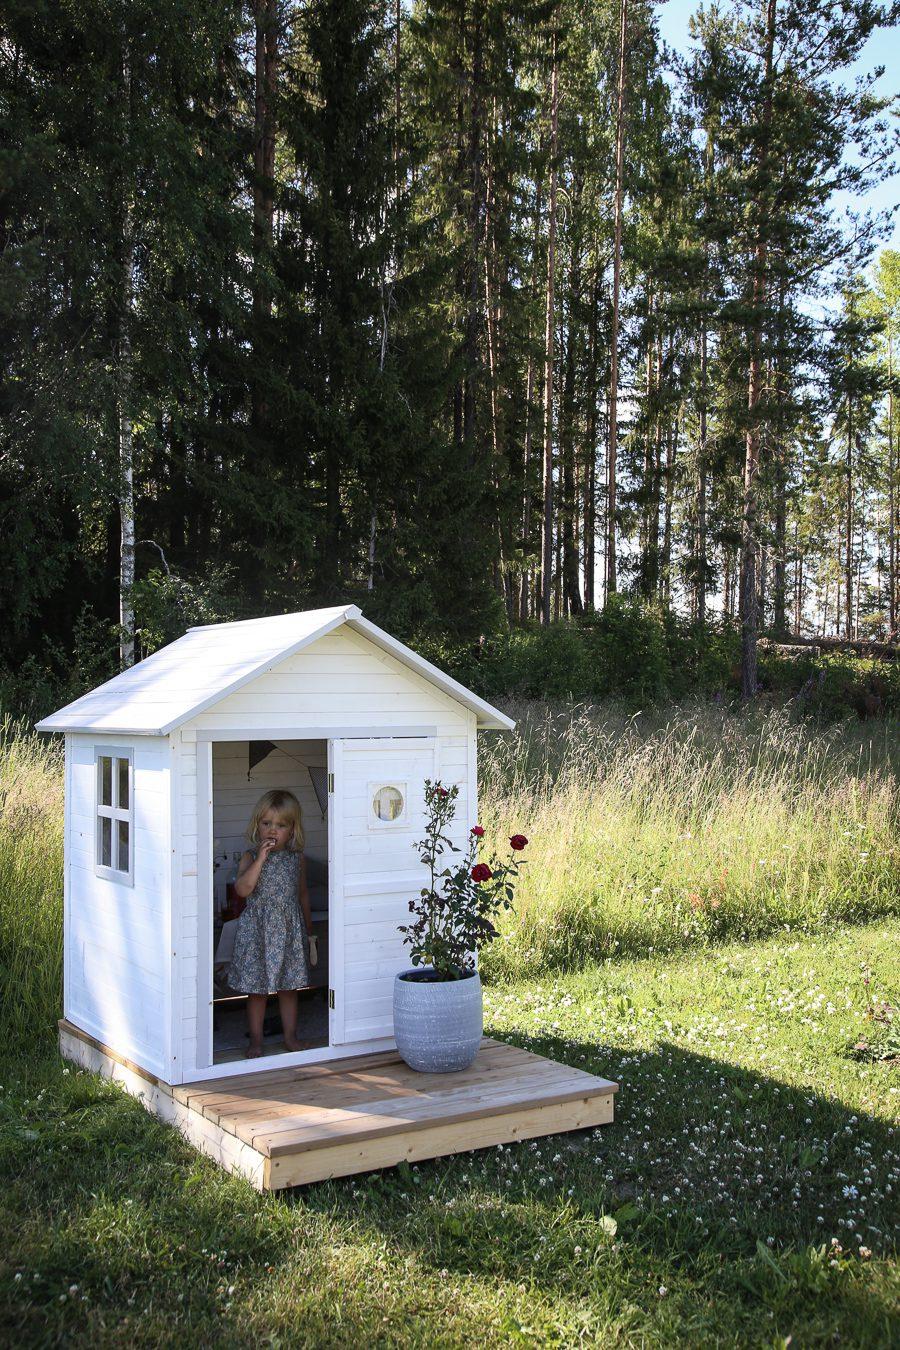 viktoria.holmgren.lovely.life.lekstuga.jollyroom.woodlii1